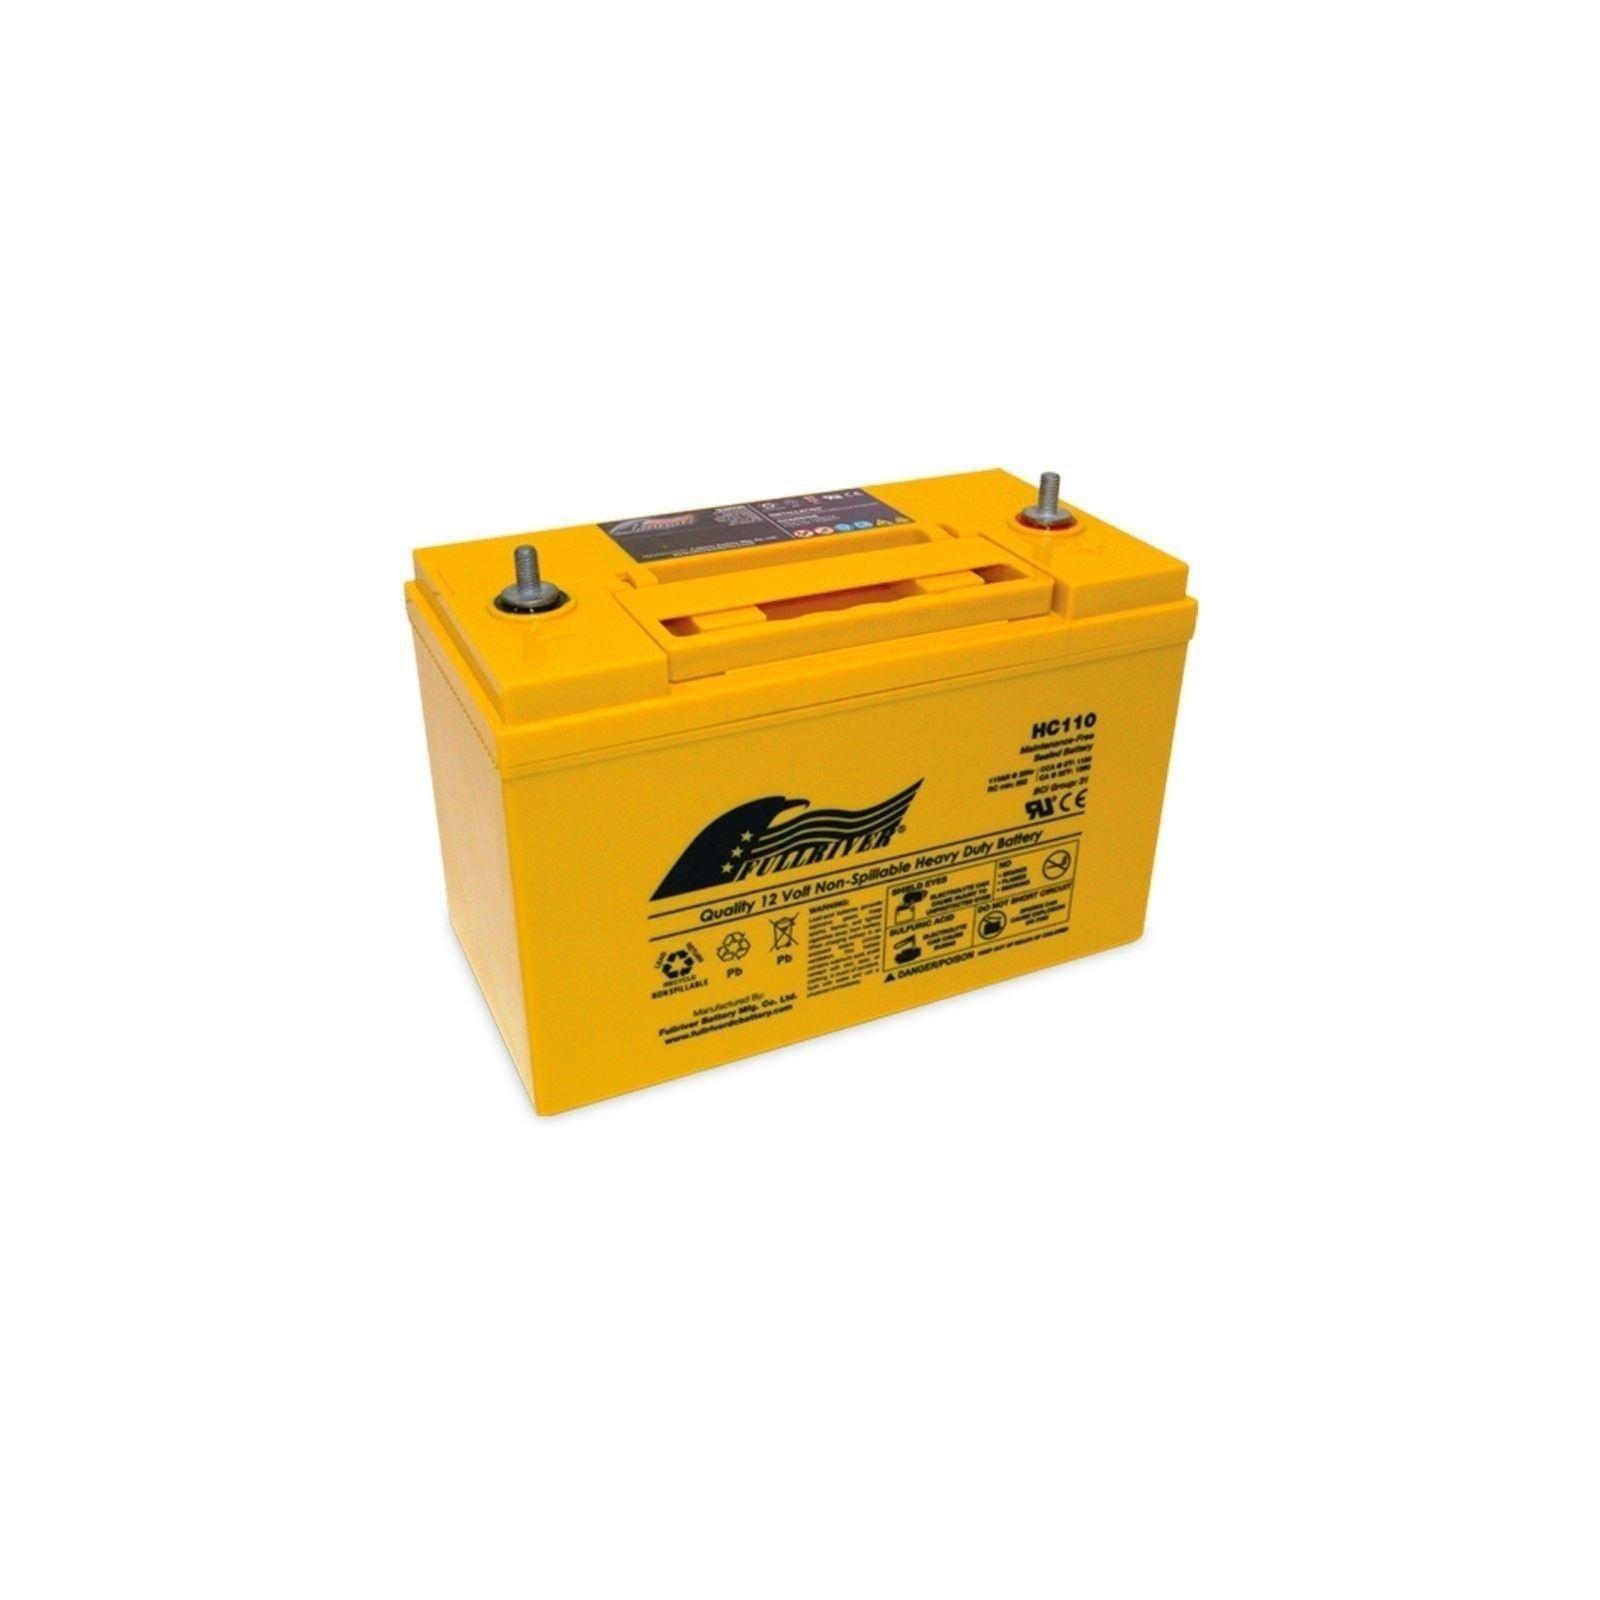 BATERIA Fullriver FULLRIVER HC110 110Ah 1100A 12V FULLRIVER - 1